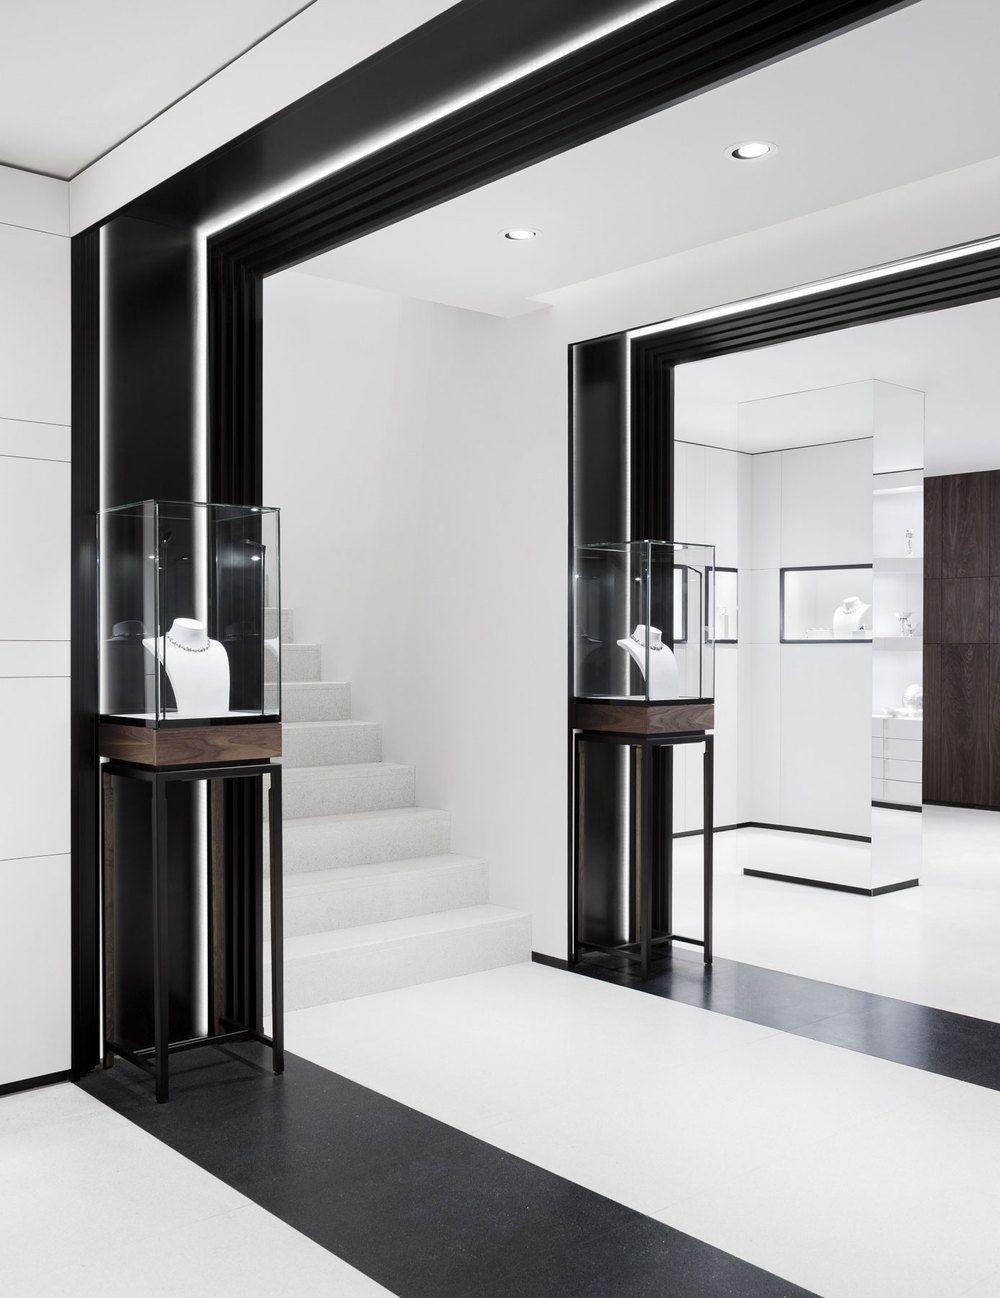 David thulstrup designs symmetrical space for georg jensen for Interior design blogs